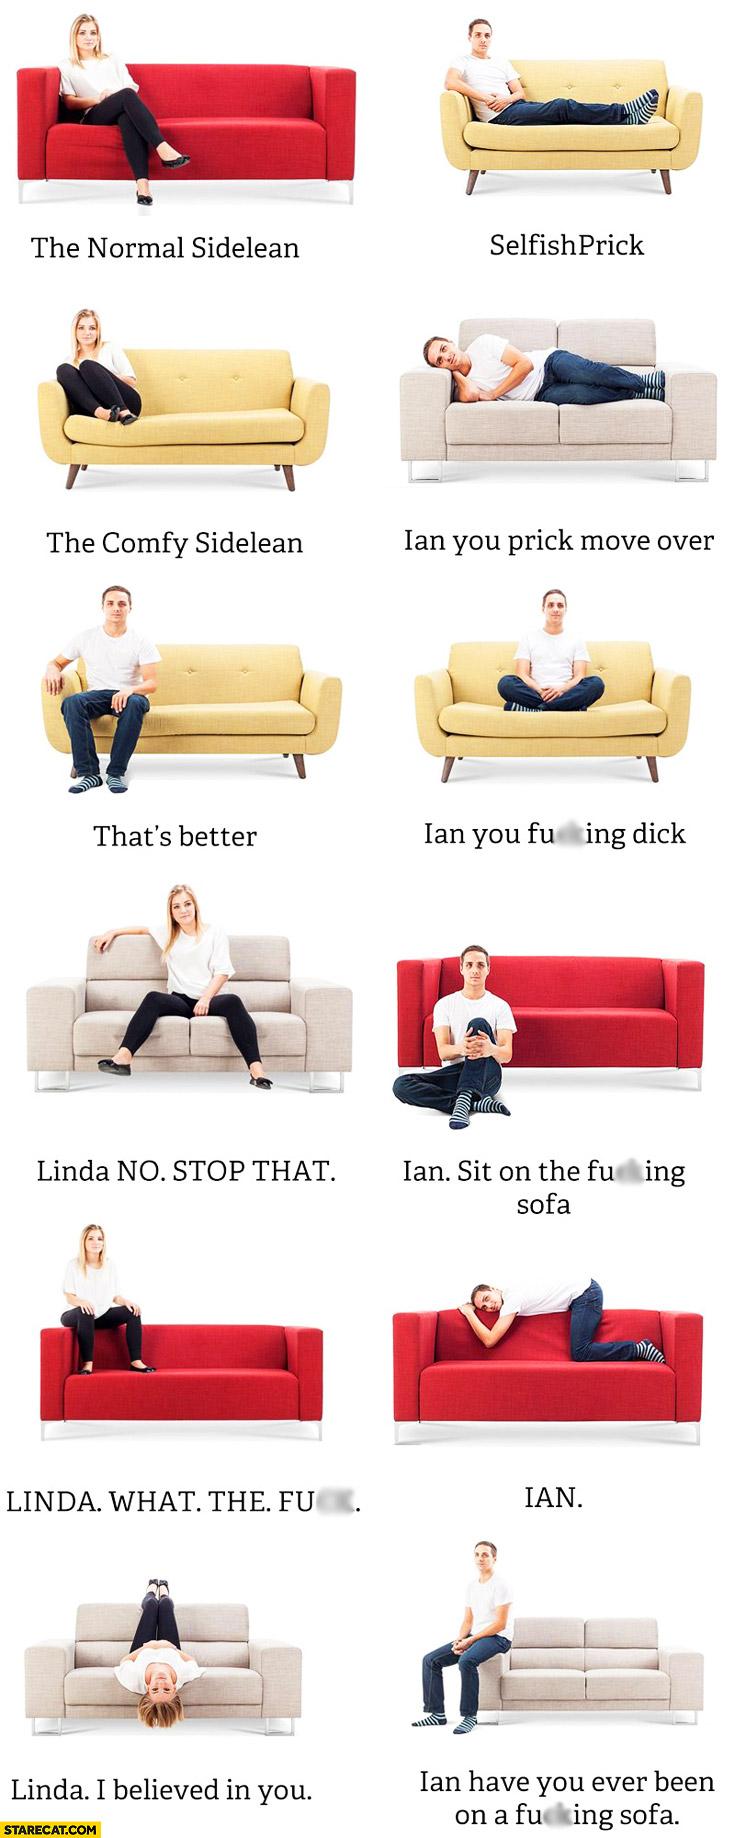 Sitting on a sofa positions Linda Ian trolling